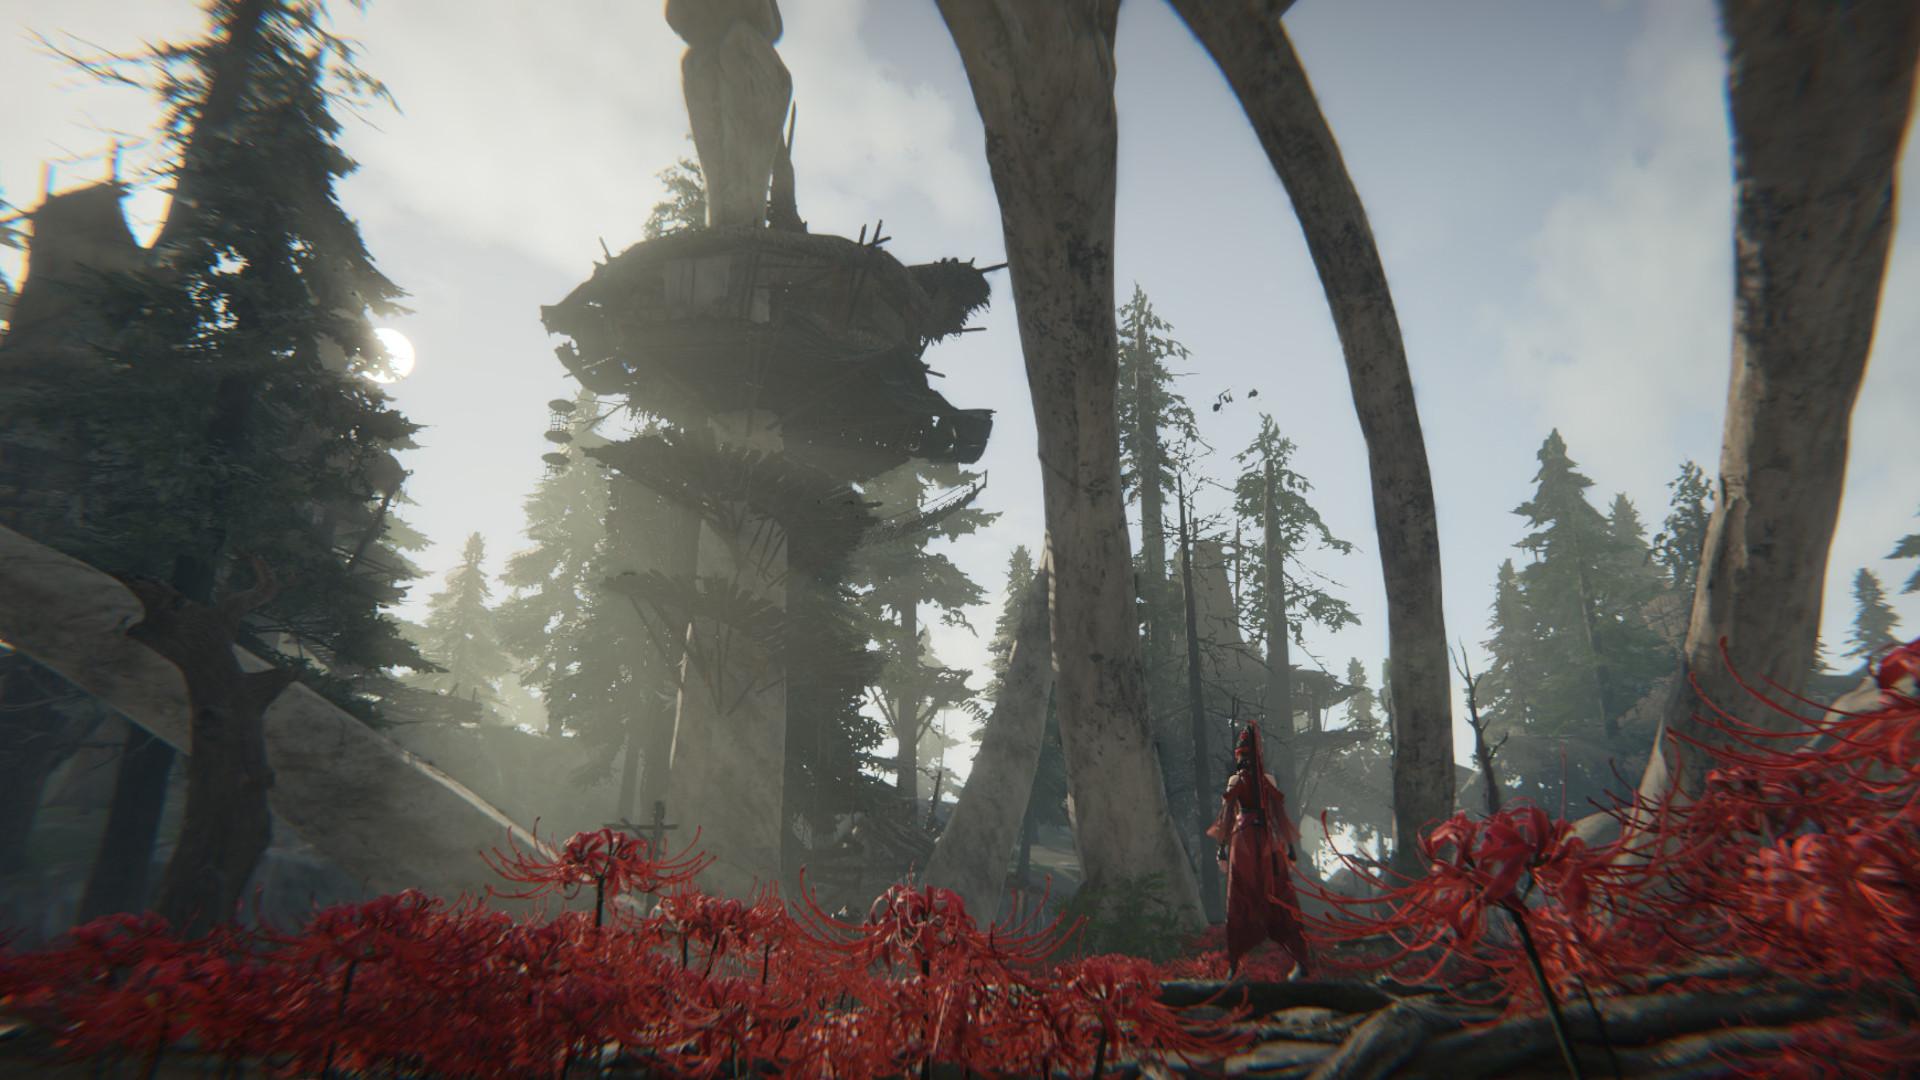 Parkour battle royale Naraka: Bladepoint starts open beta, gets nearly 100k concurrent players